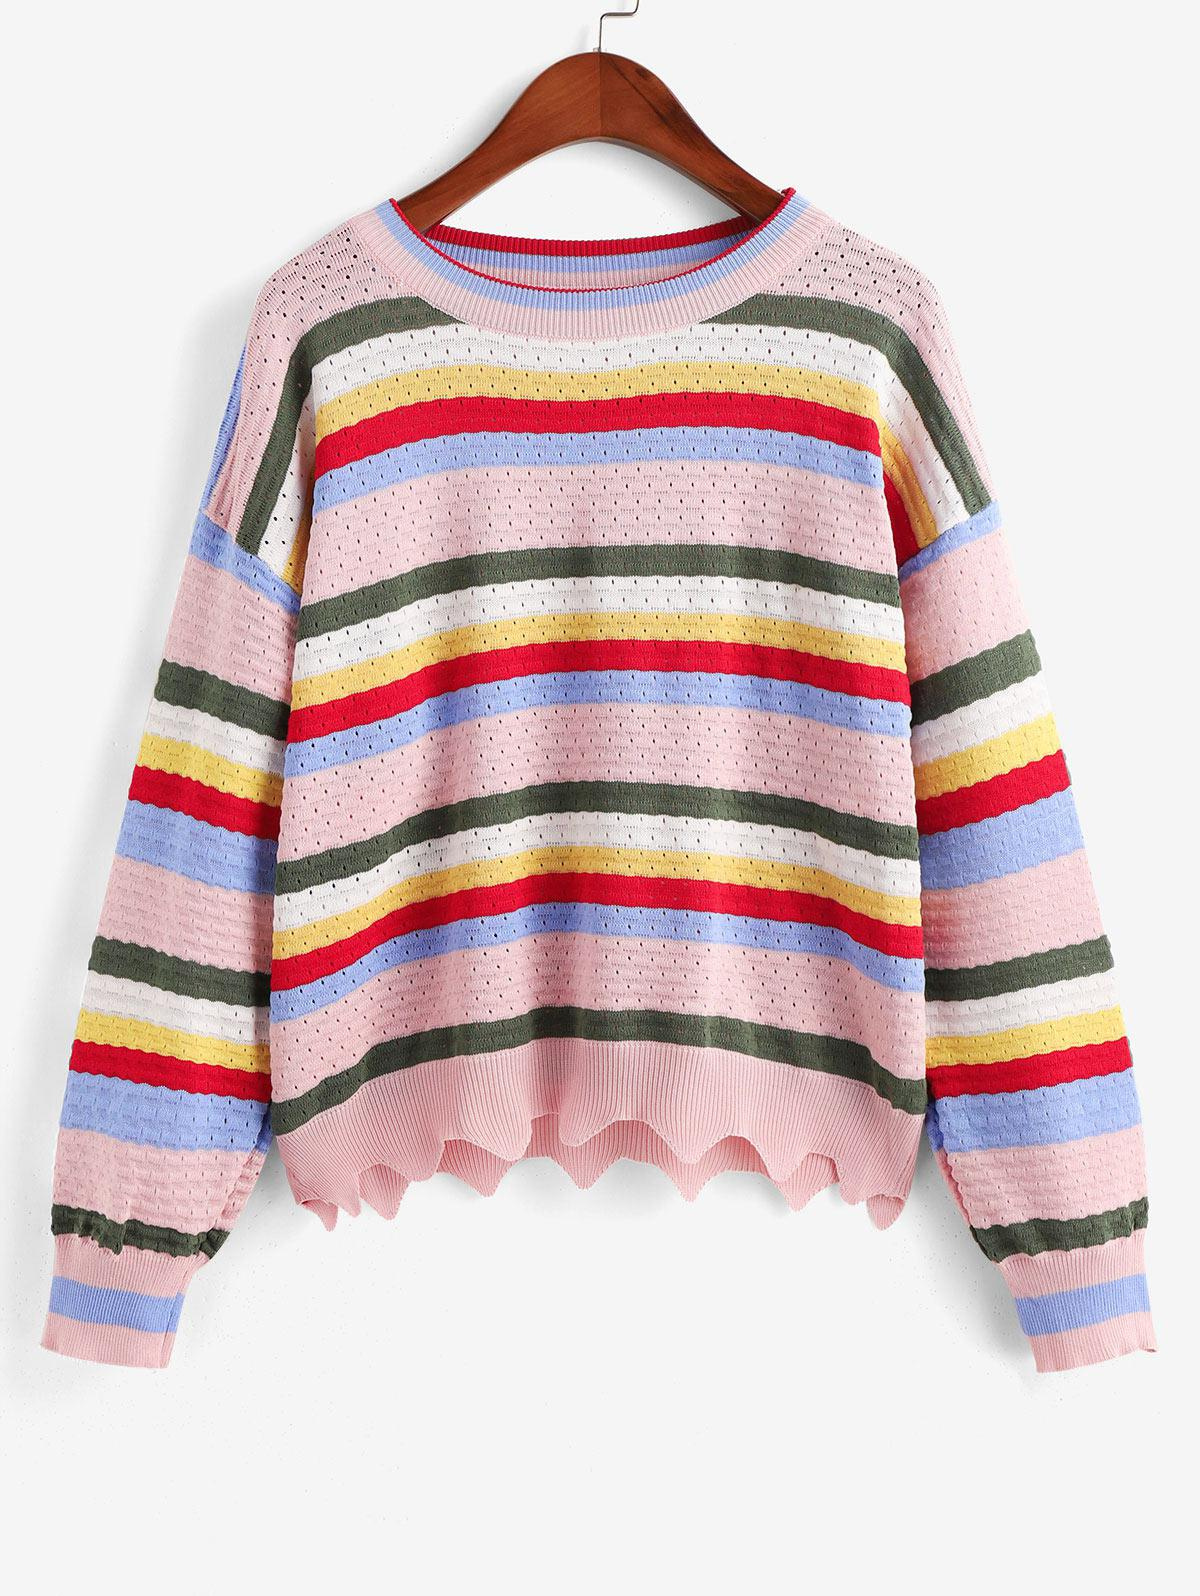 Zig Zag Hem Stripes Pointelle Knit Crew Neck Sweater